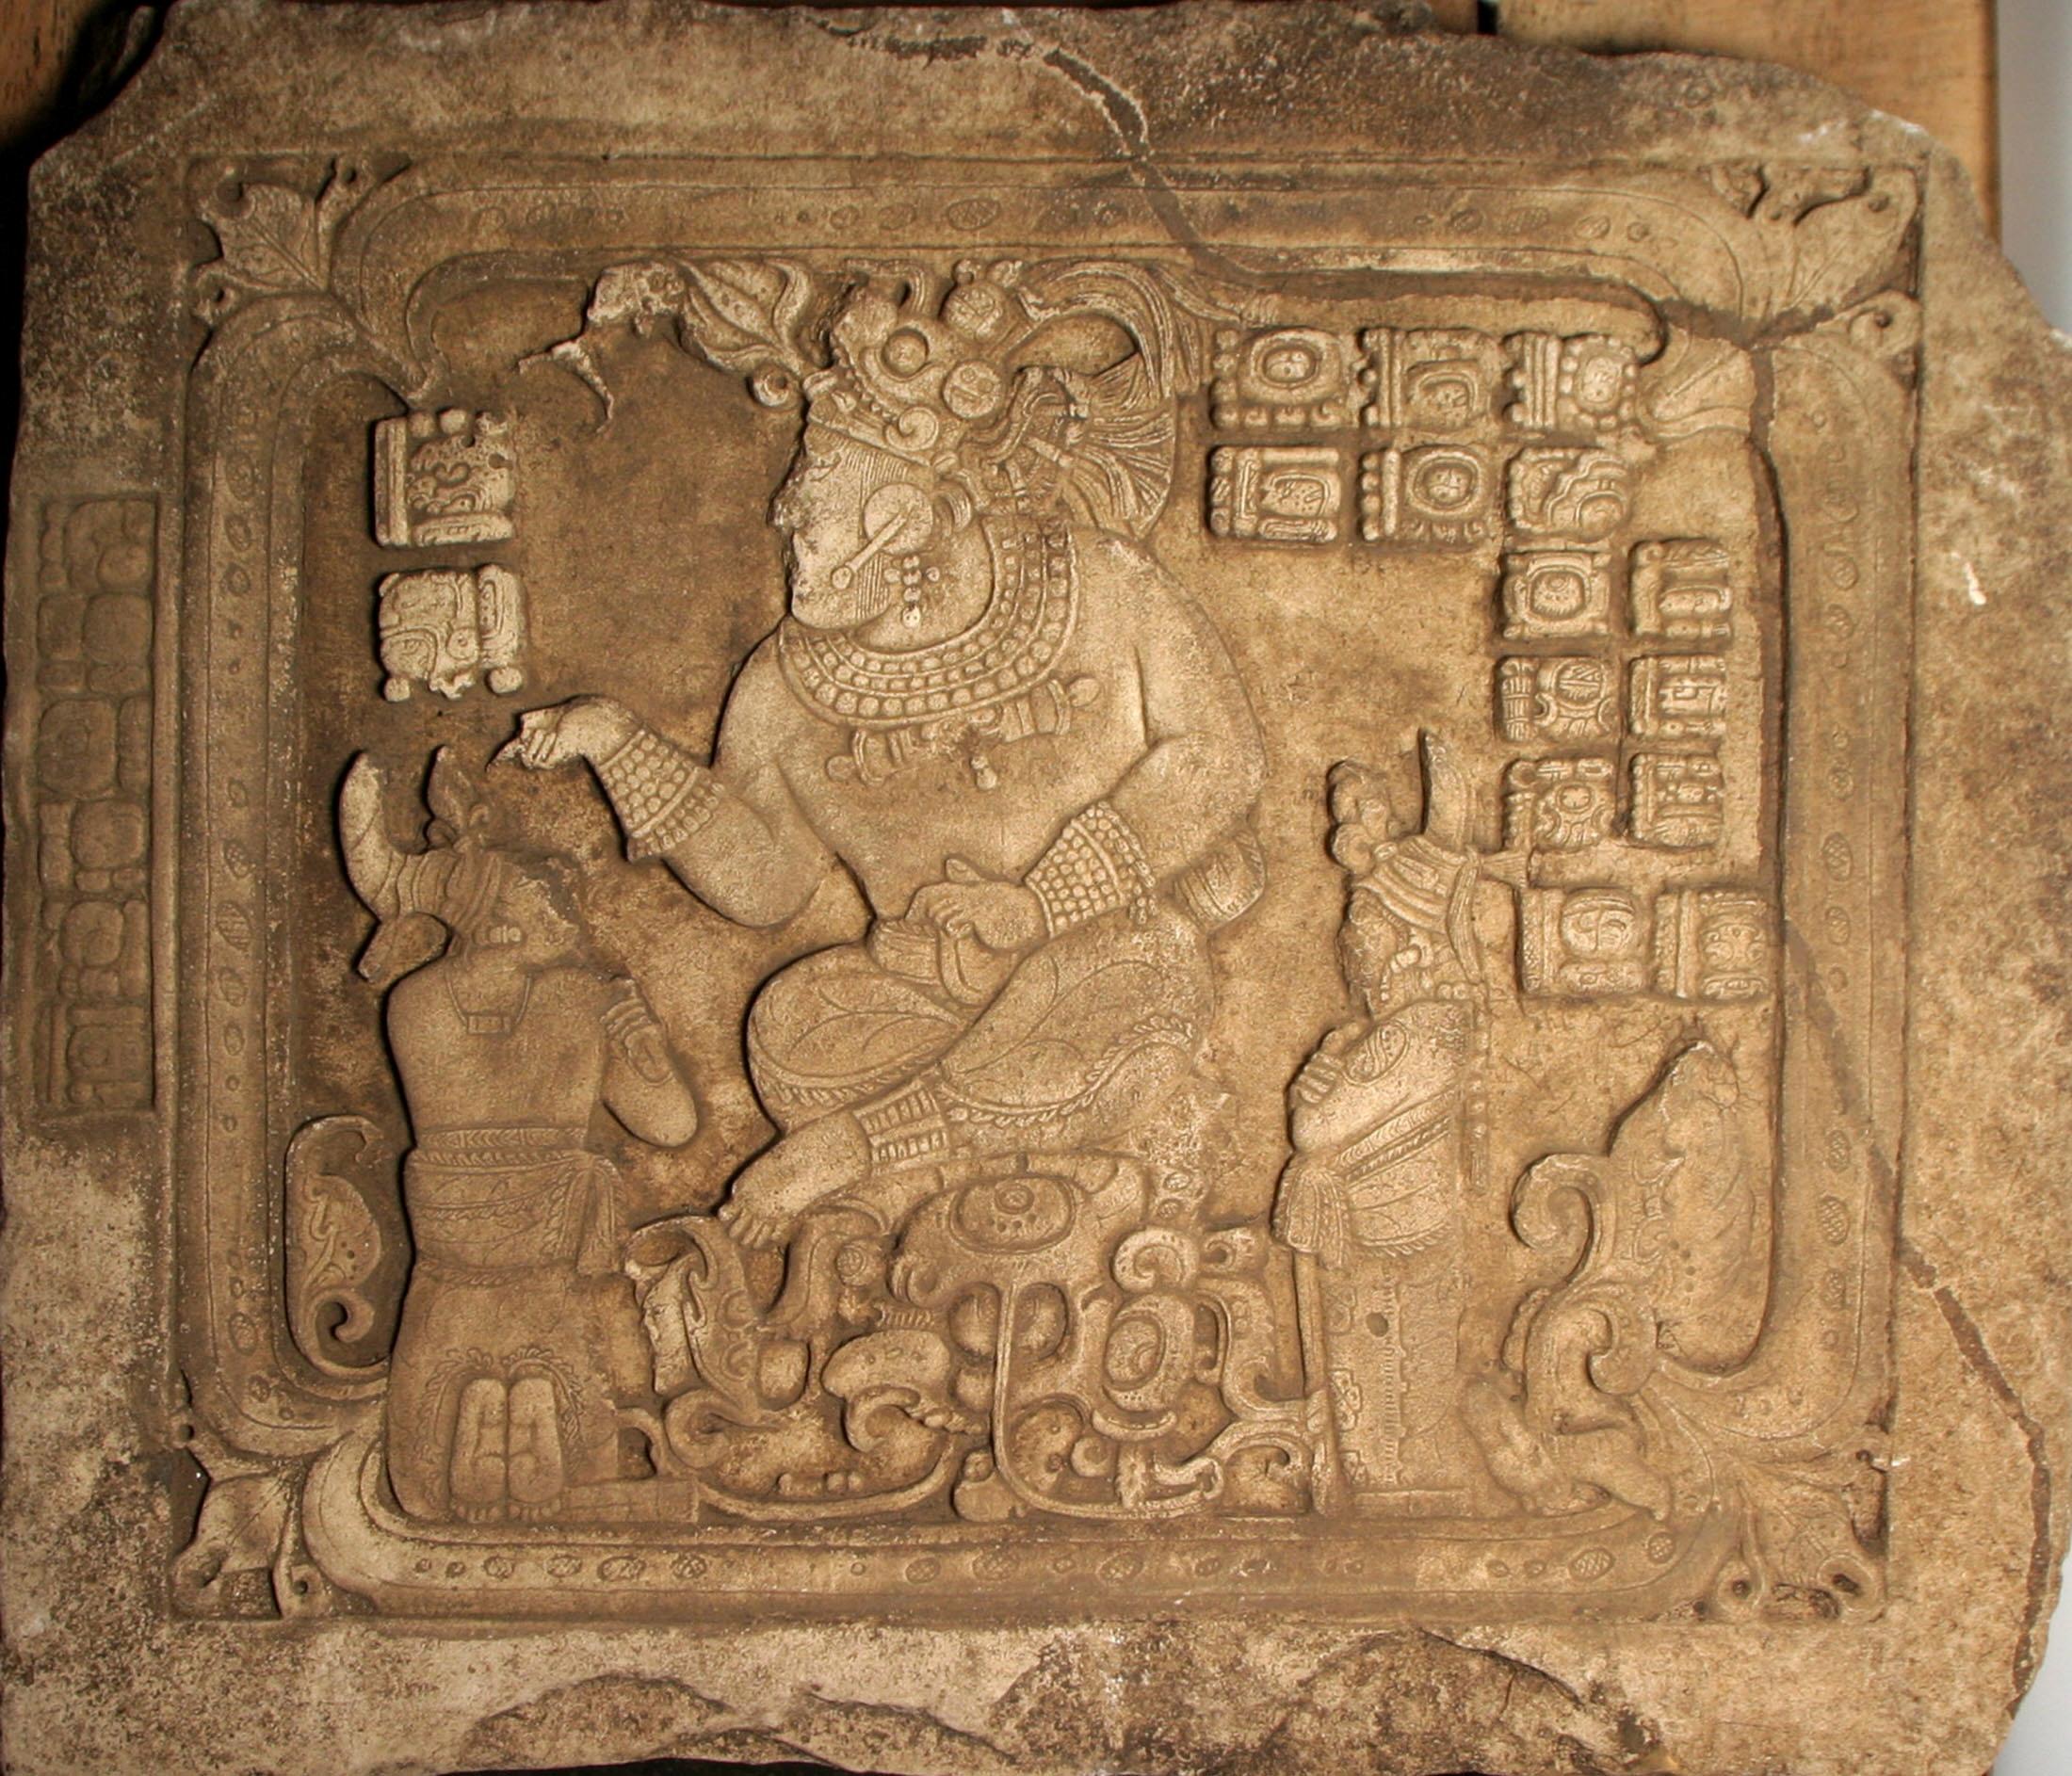 mayans never predicted december 2012 apocalypse